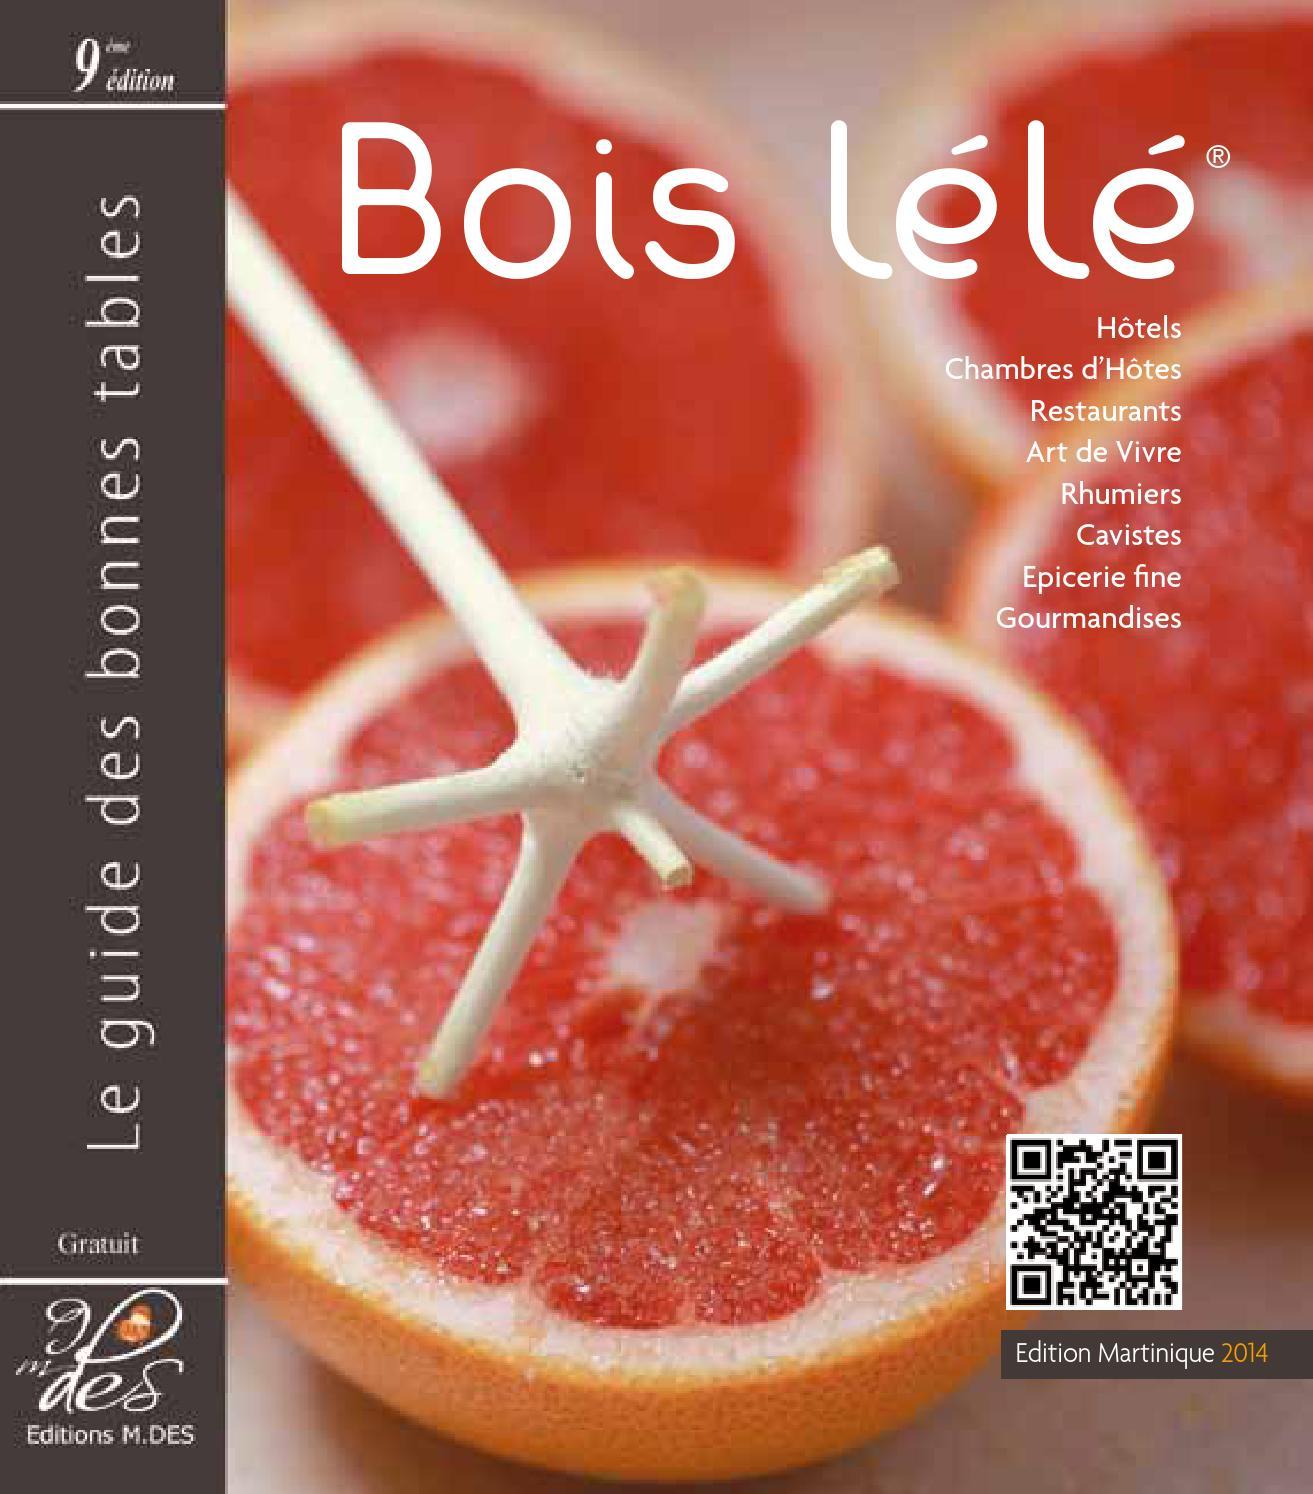 Guideboislele9 by Guide Bois Lélé issuu